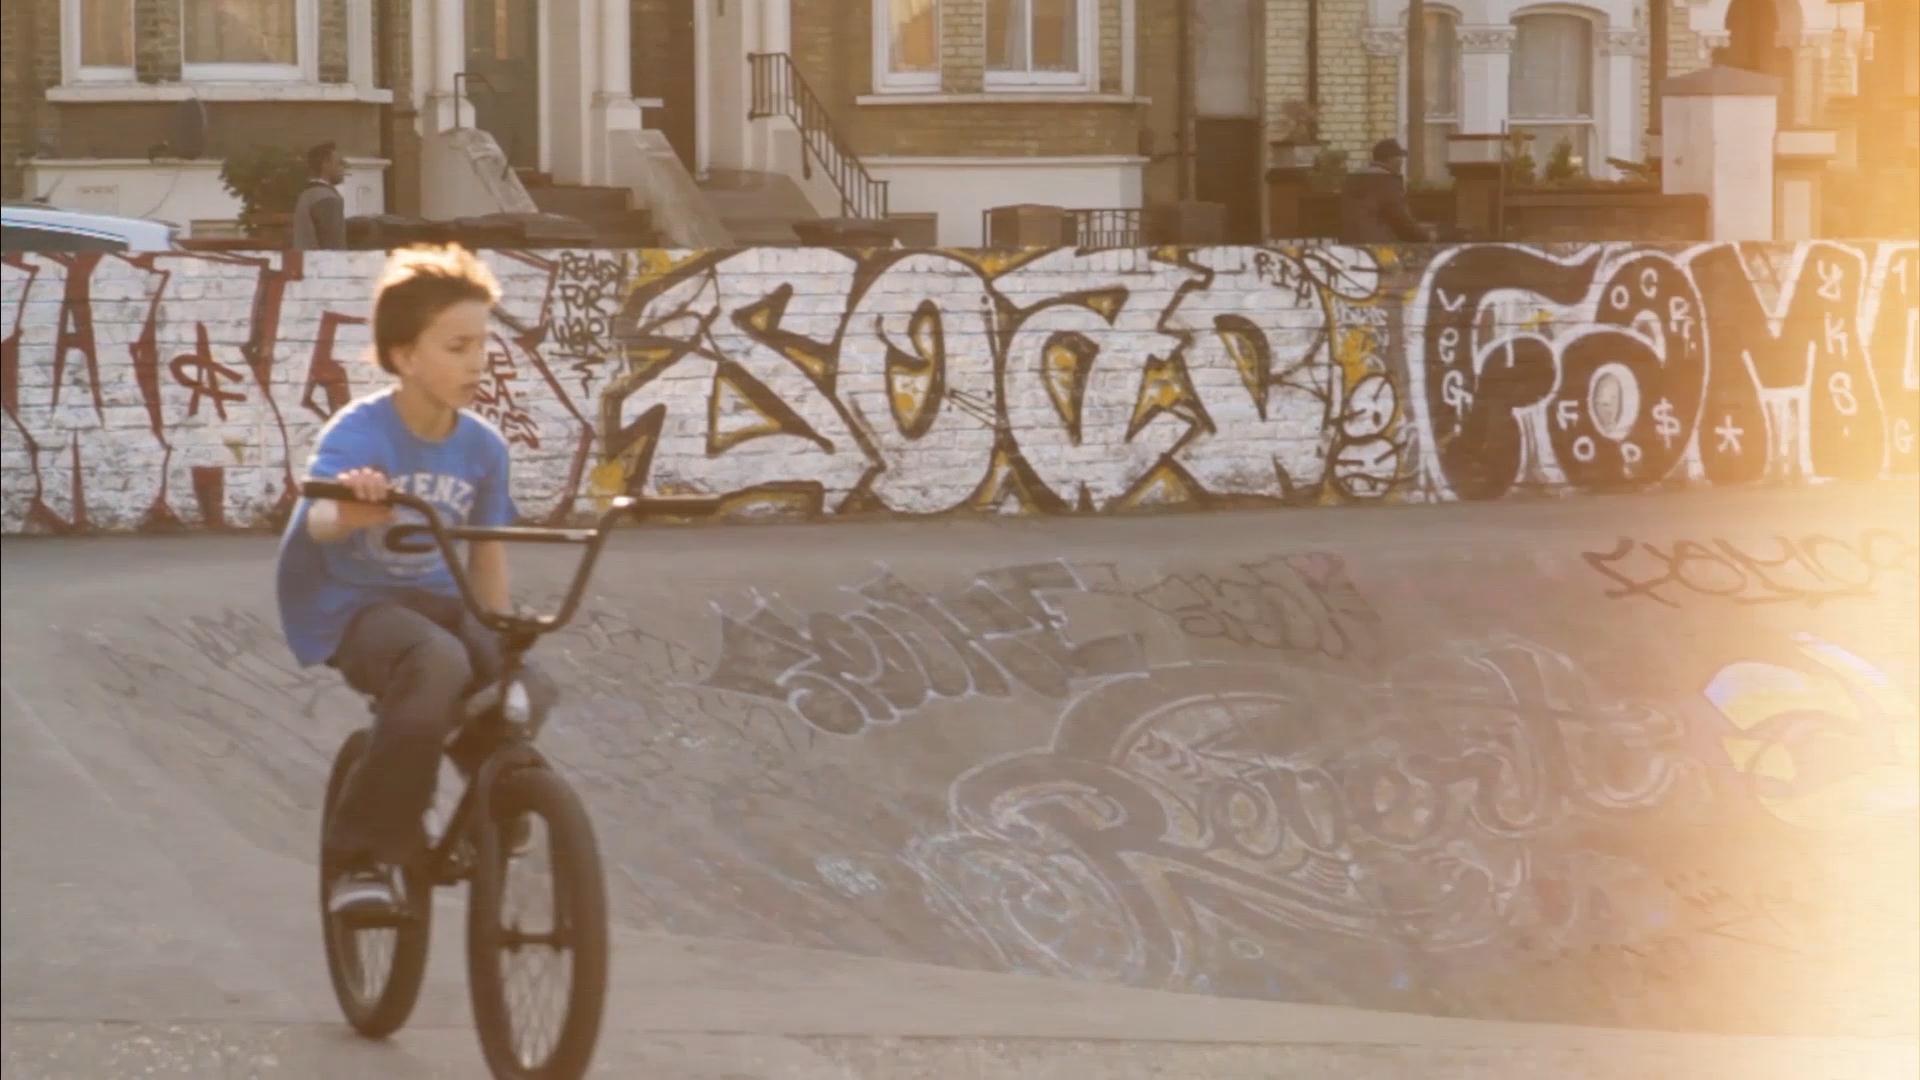 Brixton, Brixton - SHORT FILM - 2015